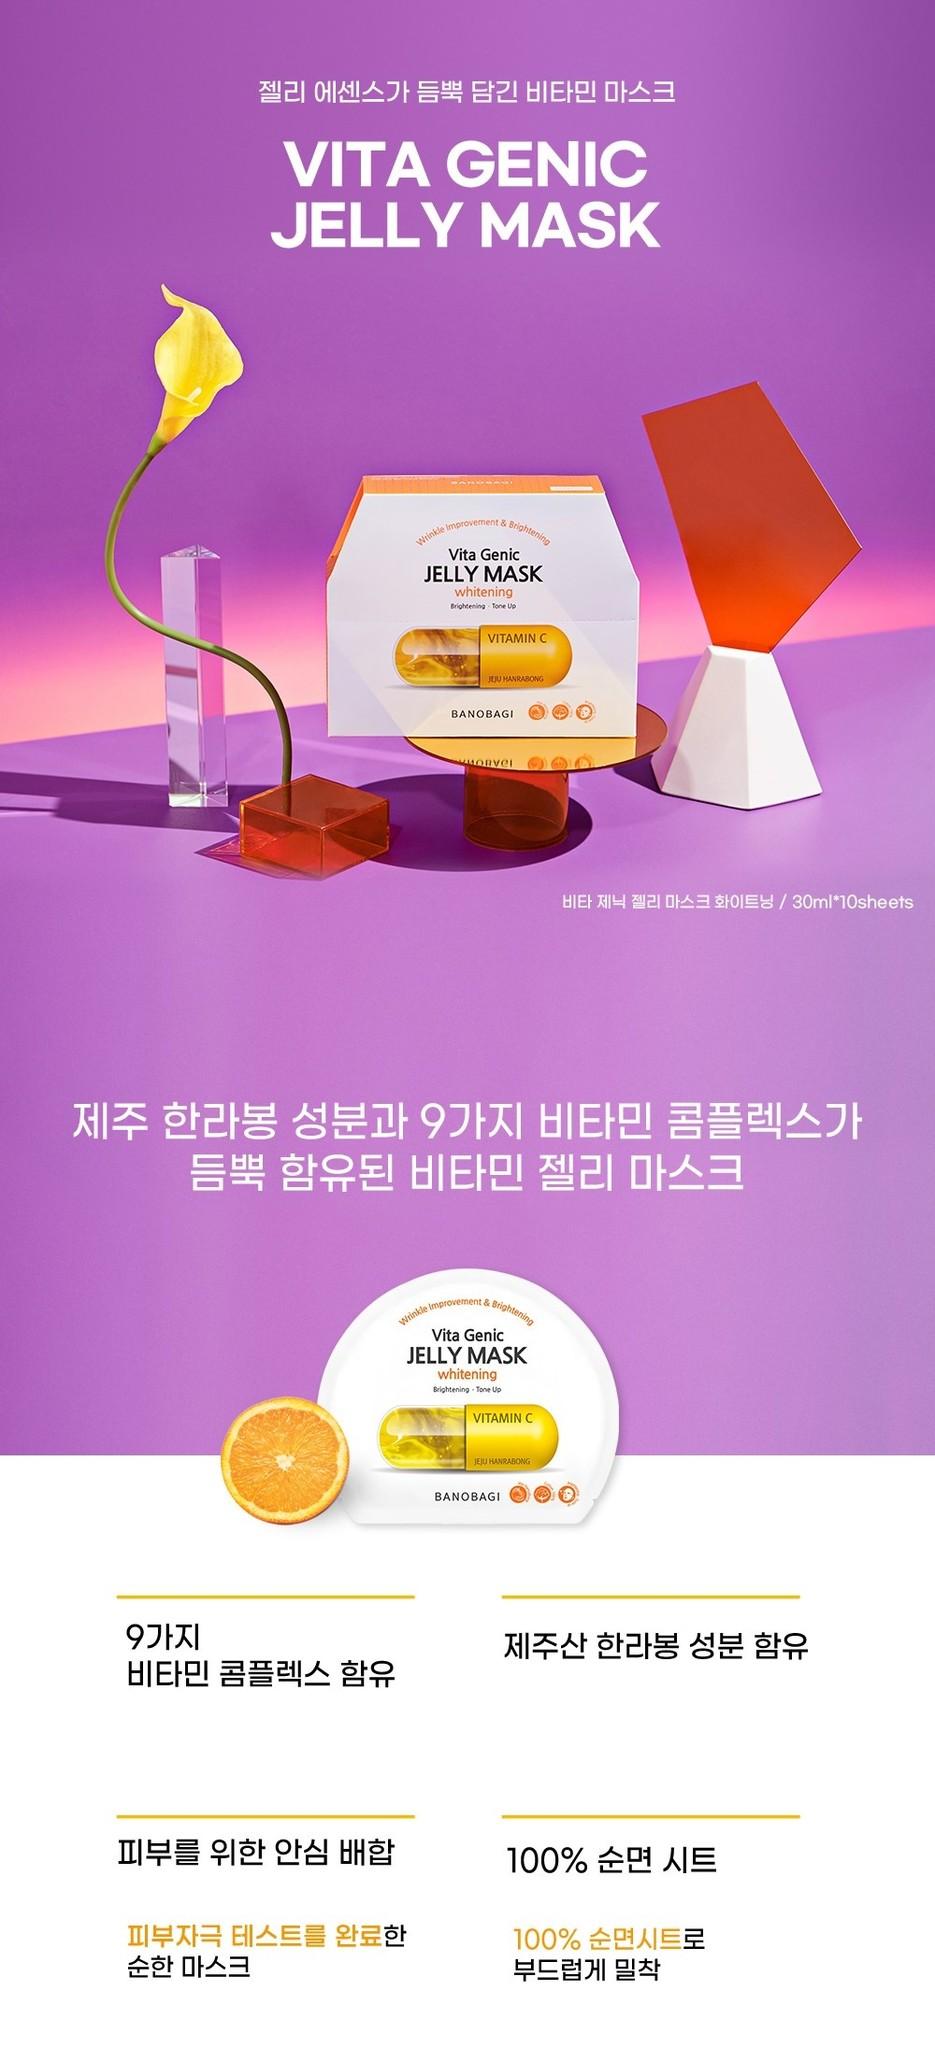 Vita Genic Jelly Mask Whitening-2